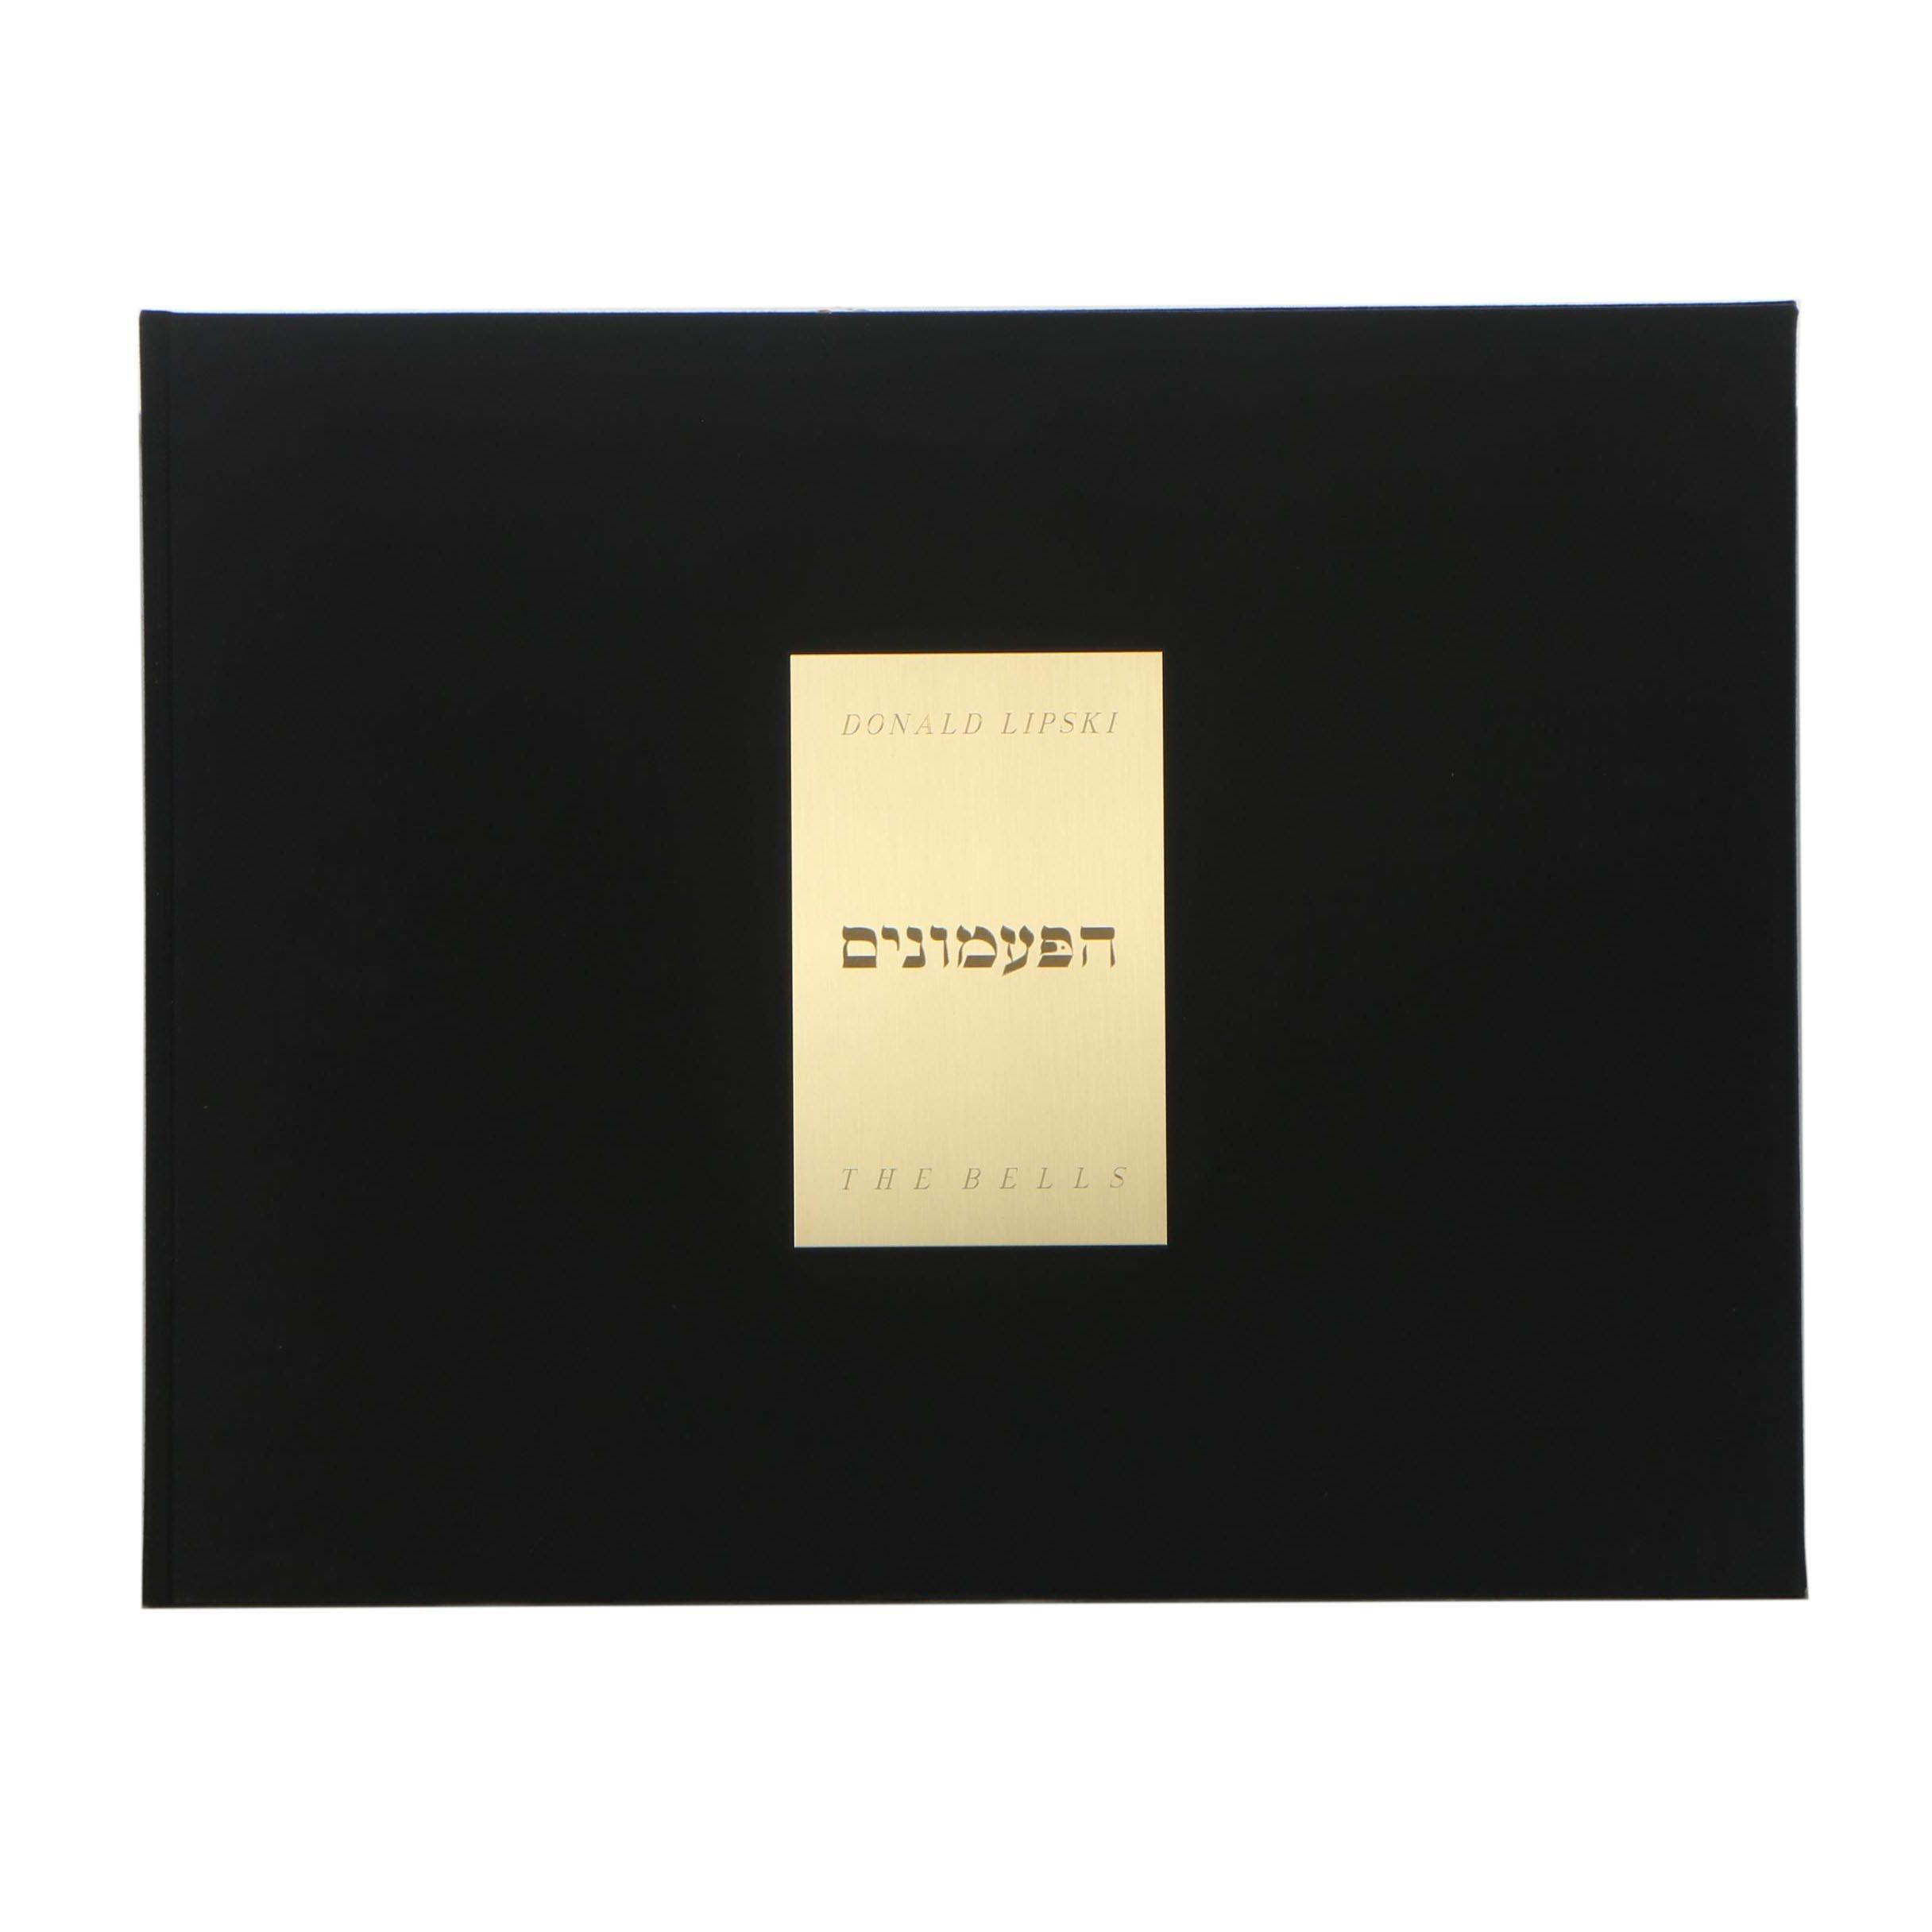 "Limited Edition Exhibition Catalog ""The Bells: Donald Lipski"""